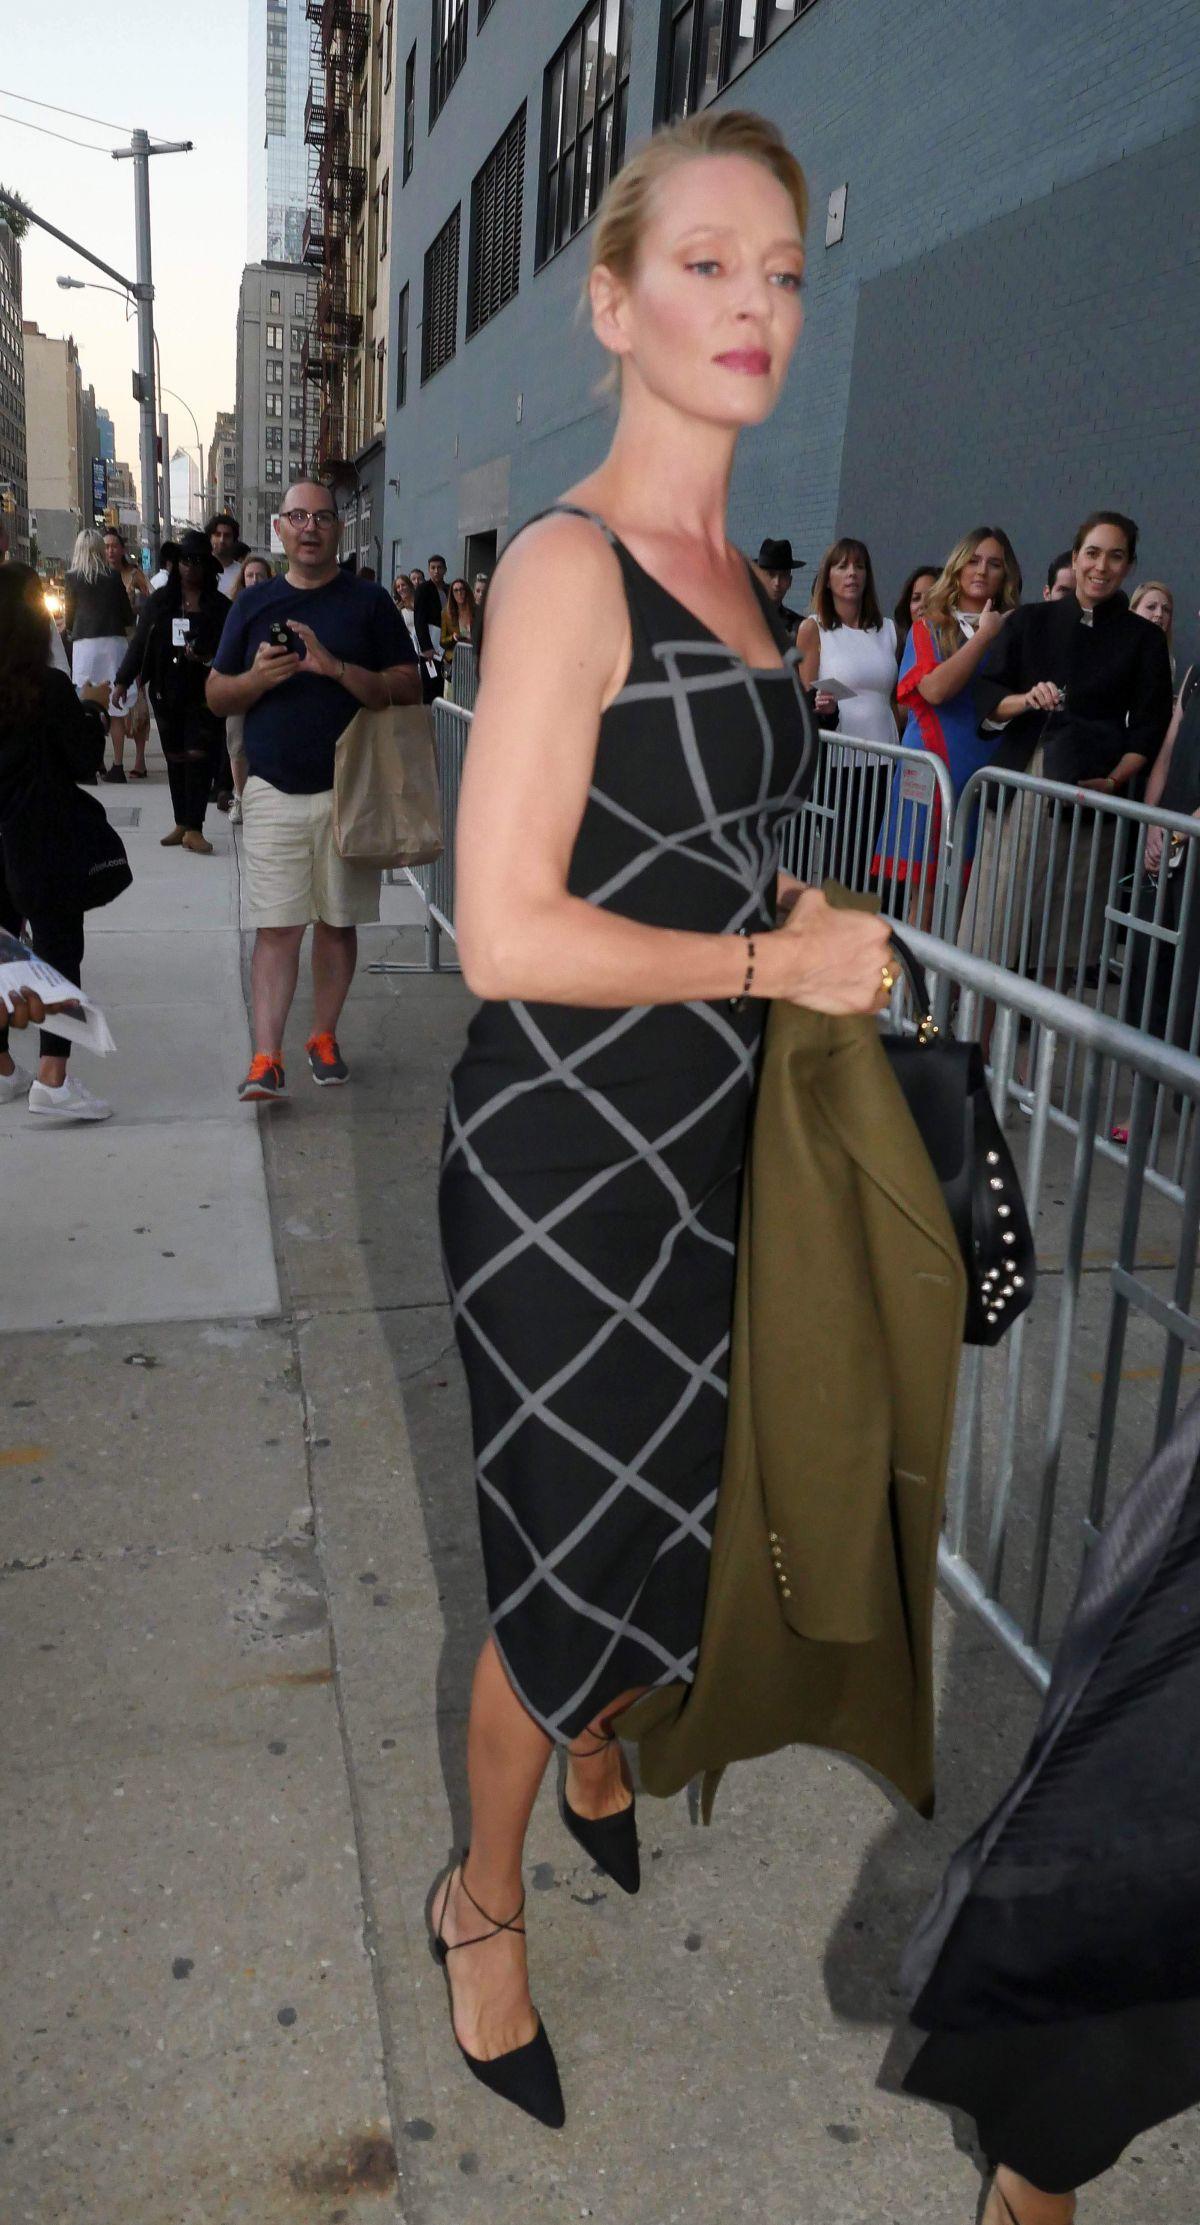 UMA THURMAN at New York Fashion Week 2016 in New York 09/12/2016